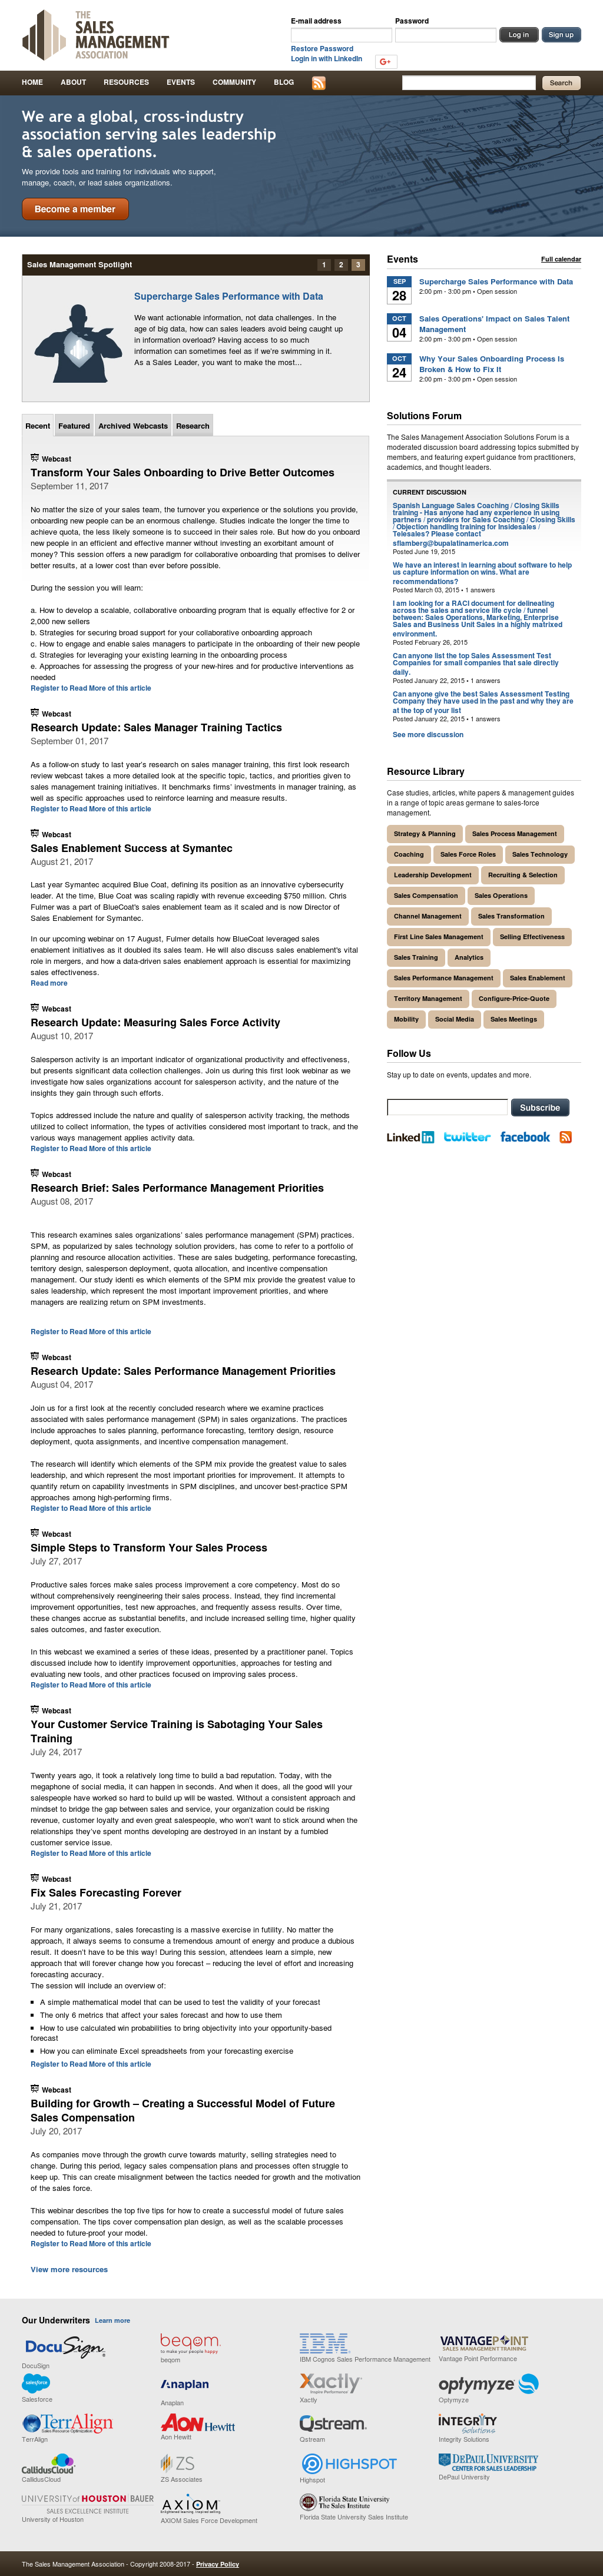 The Sales Management Association Competitors, Revenue and